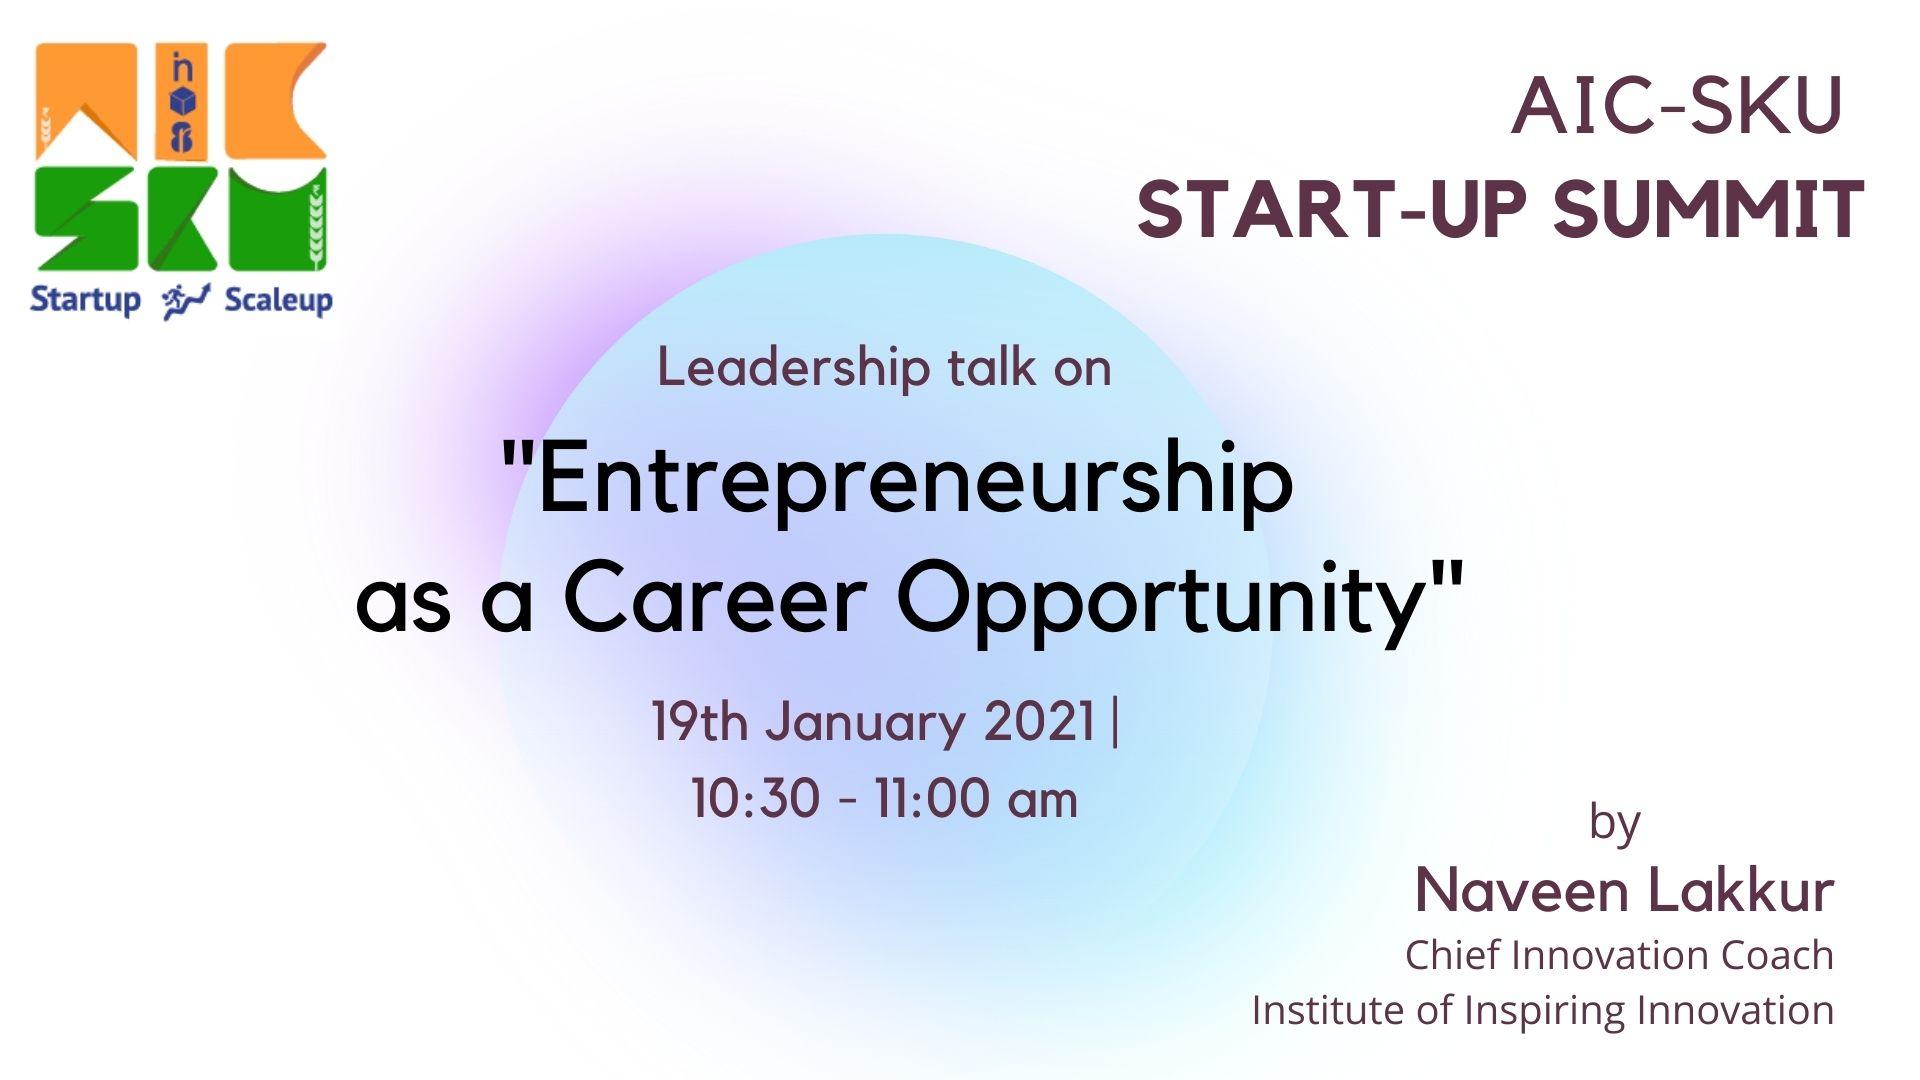 AIC-SKU Start-up SUMMIT